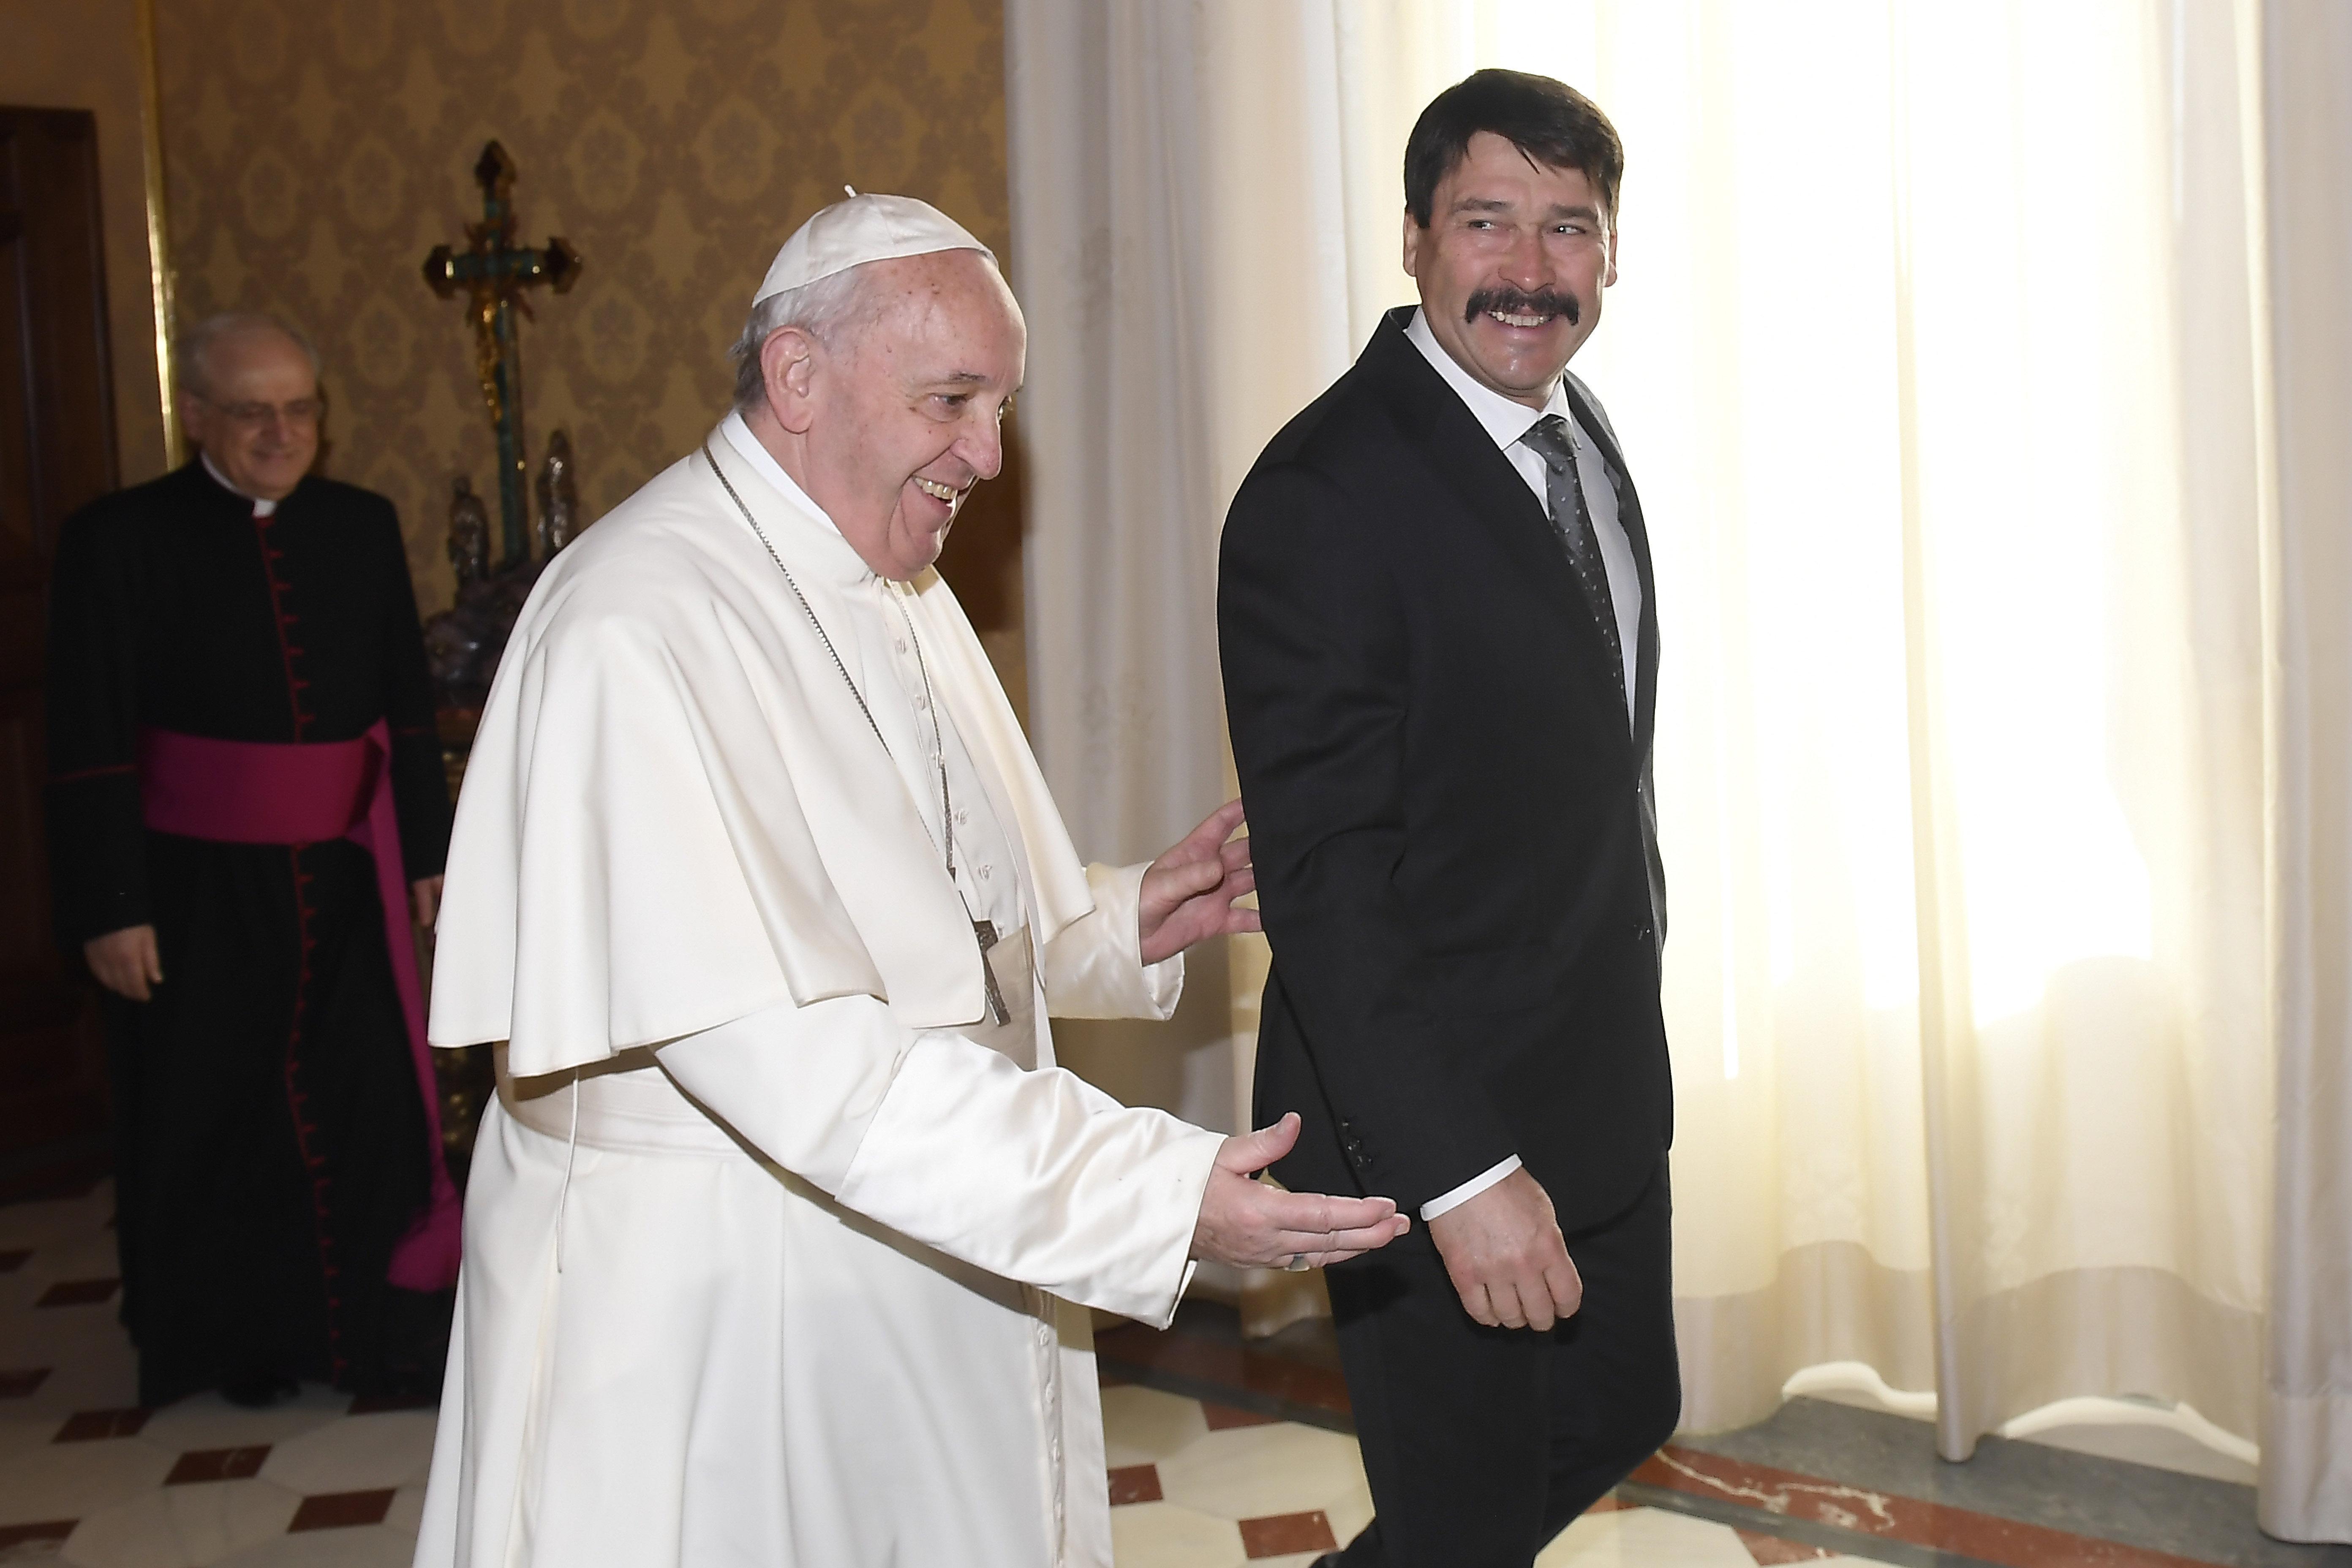 Budapost: Papst Franziskus kommt im September nach Budapest